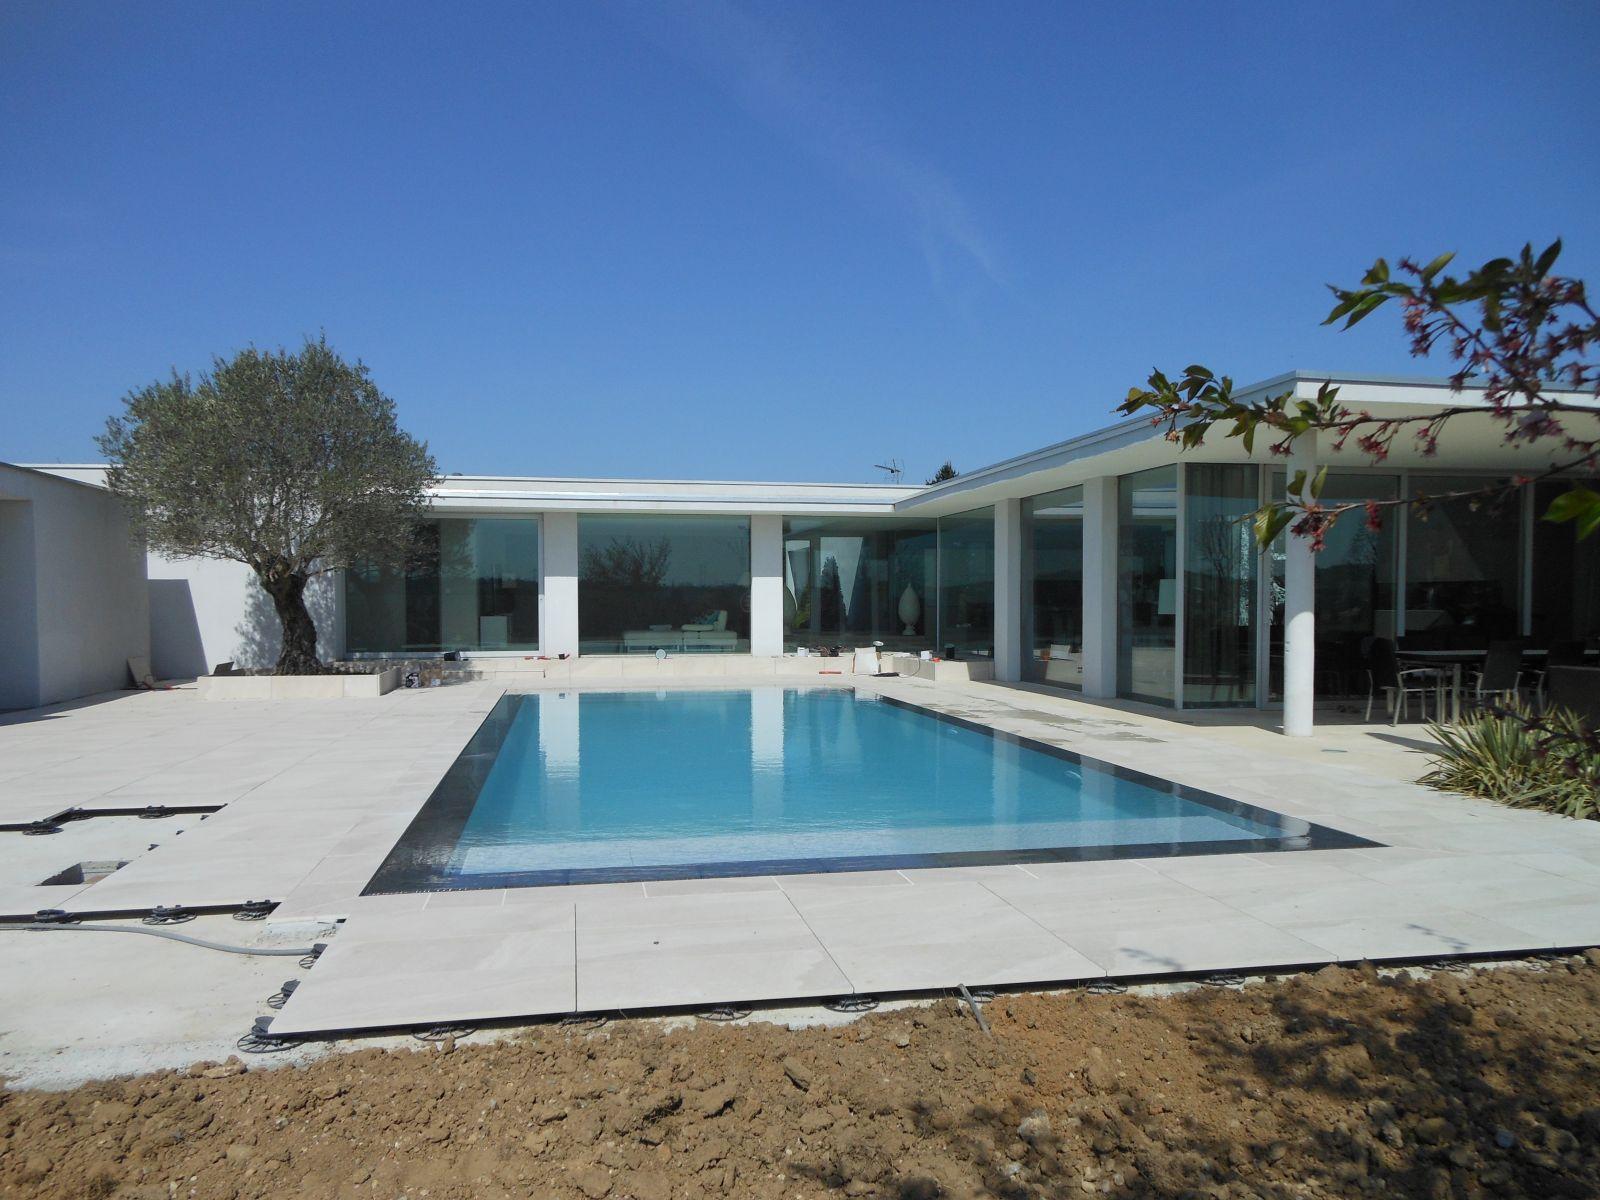 un exemple de r novation de piscine c t jardin. Black Bedroom Furniture Sets. Home Design Ideas